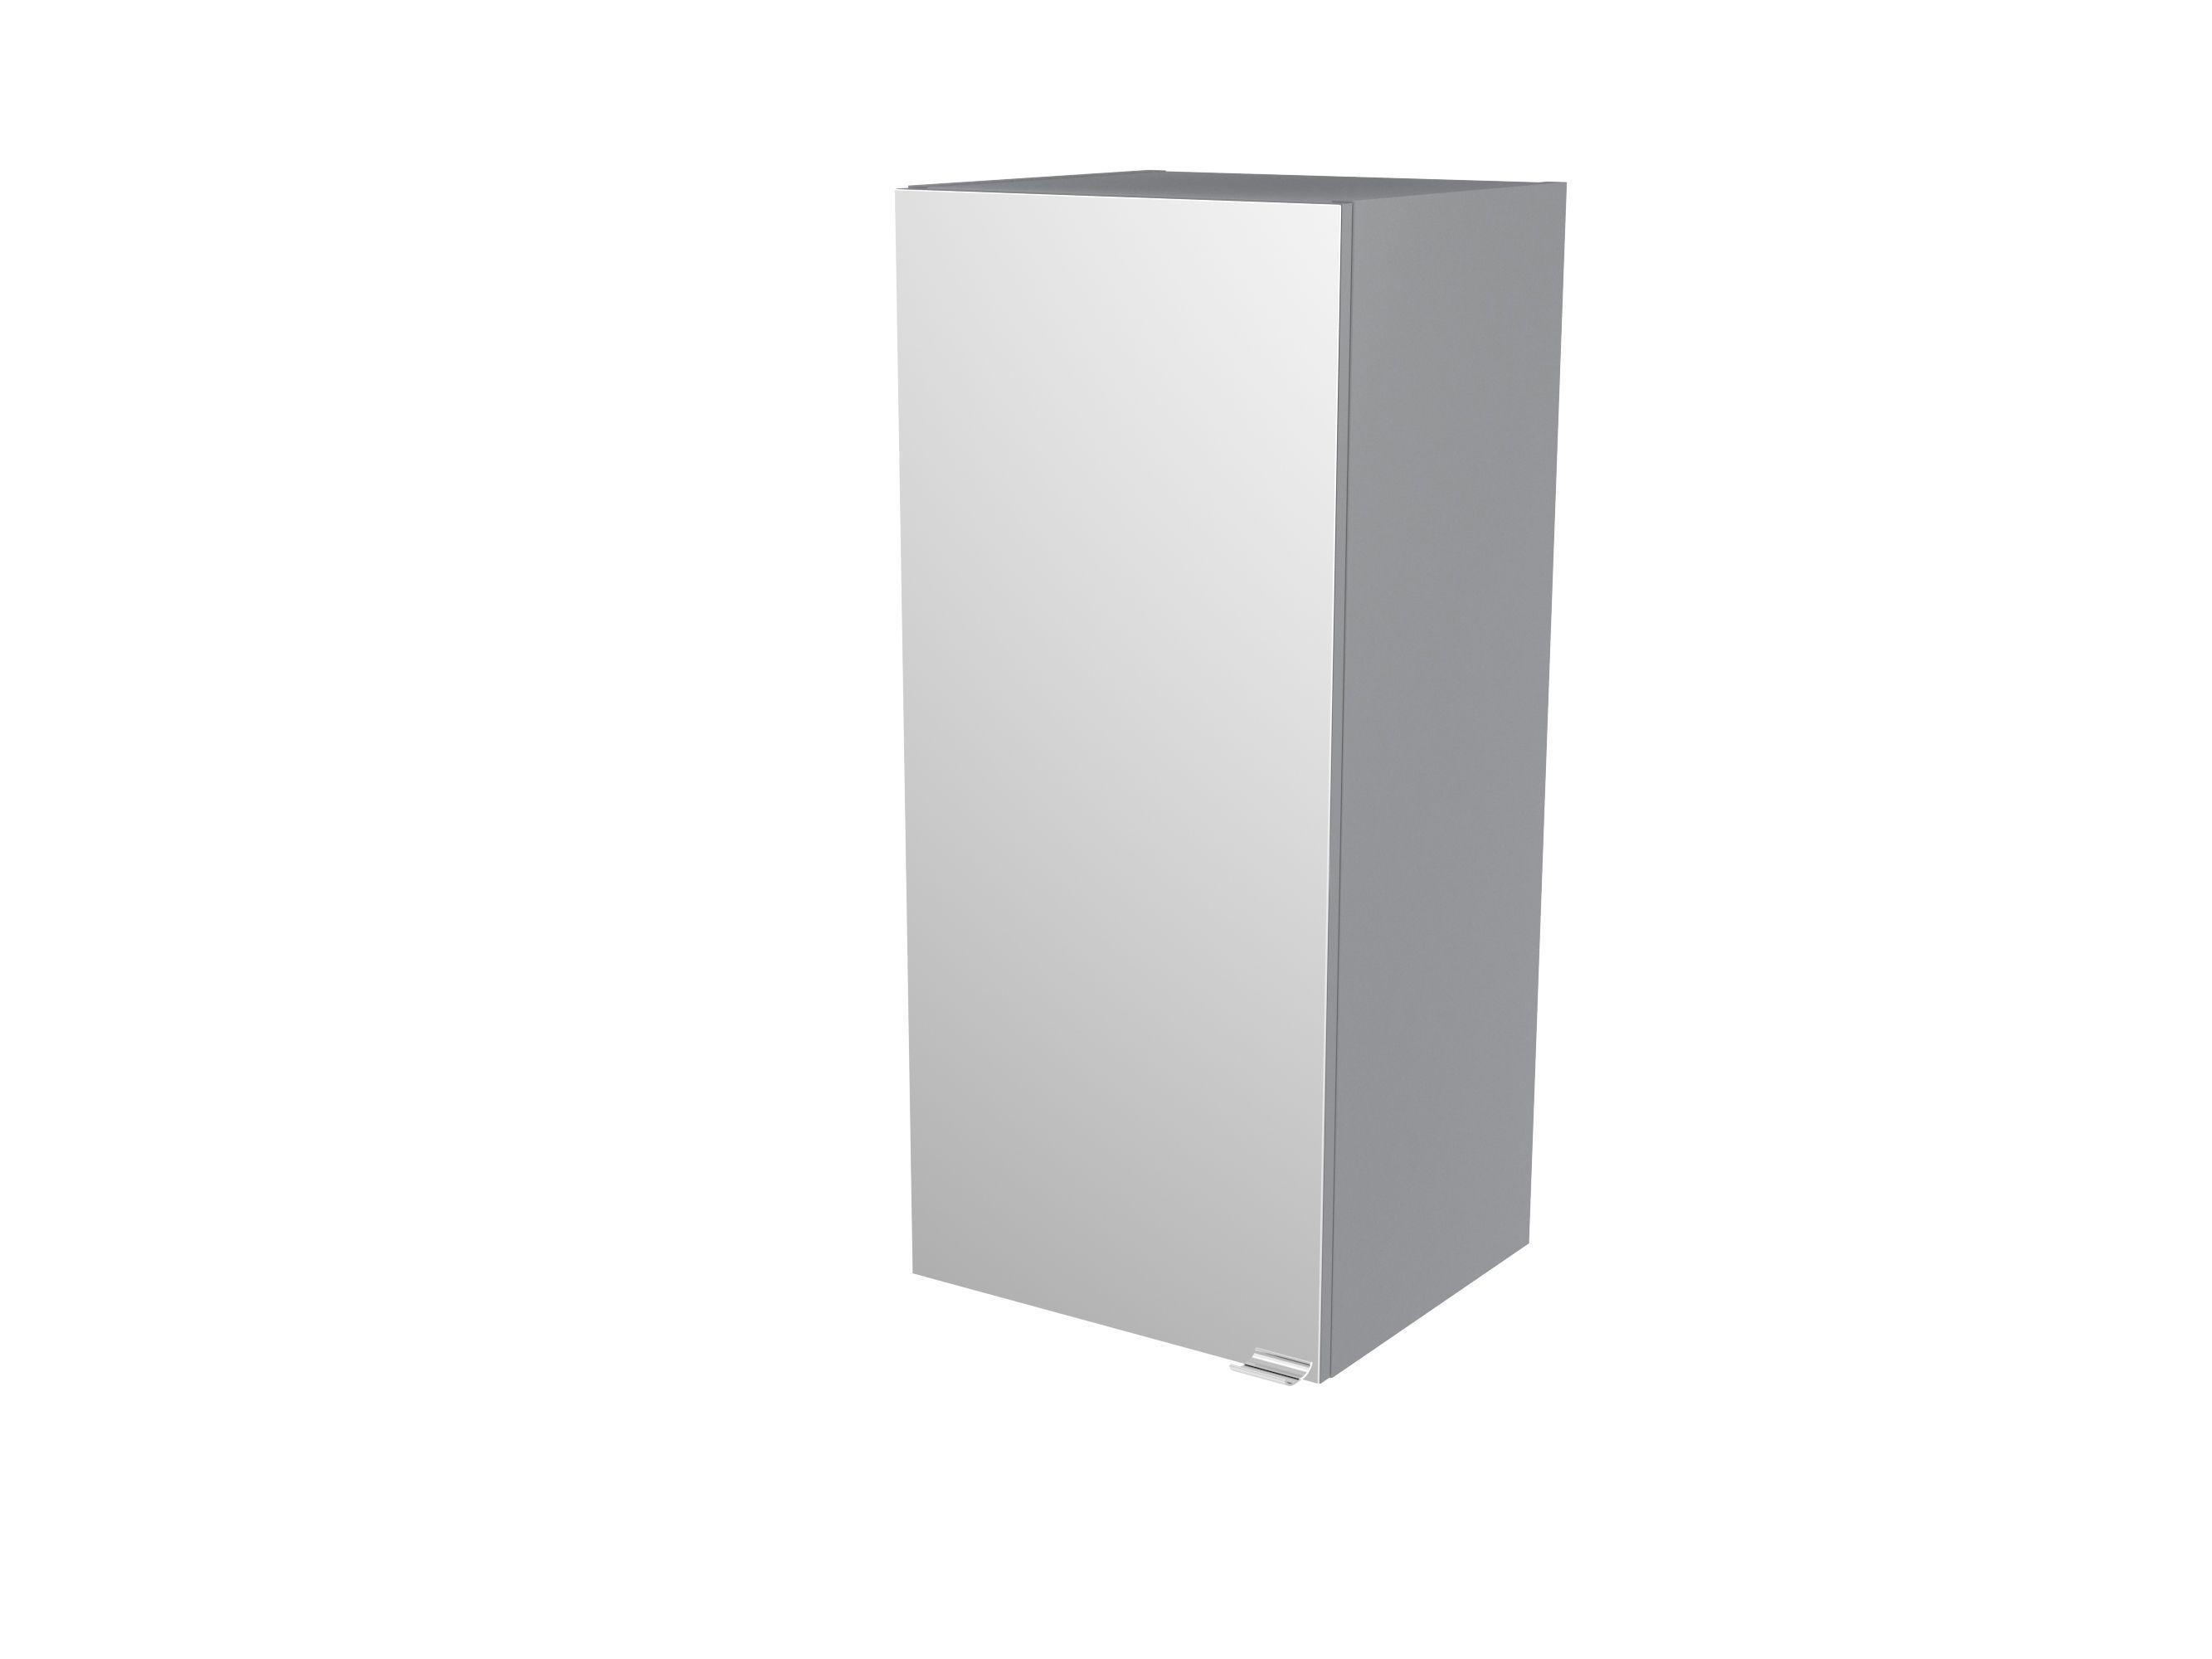 Cooke & Lewis Imandra Gloss Grey Deep Mirrored Wall Cabinet, (w)400mm